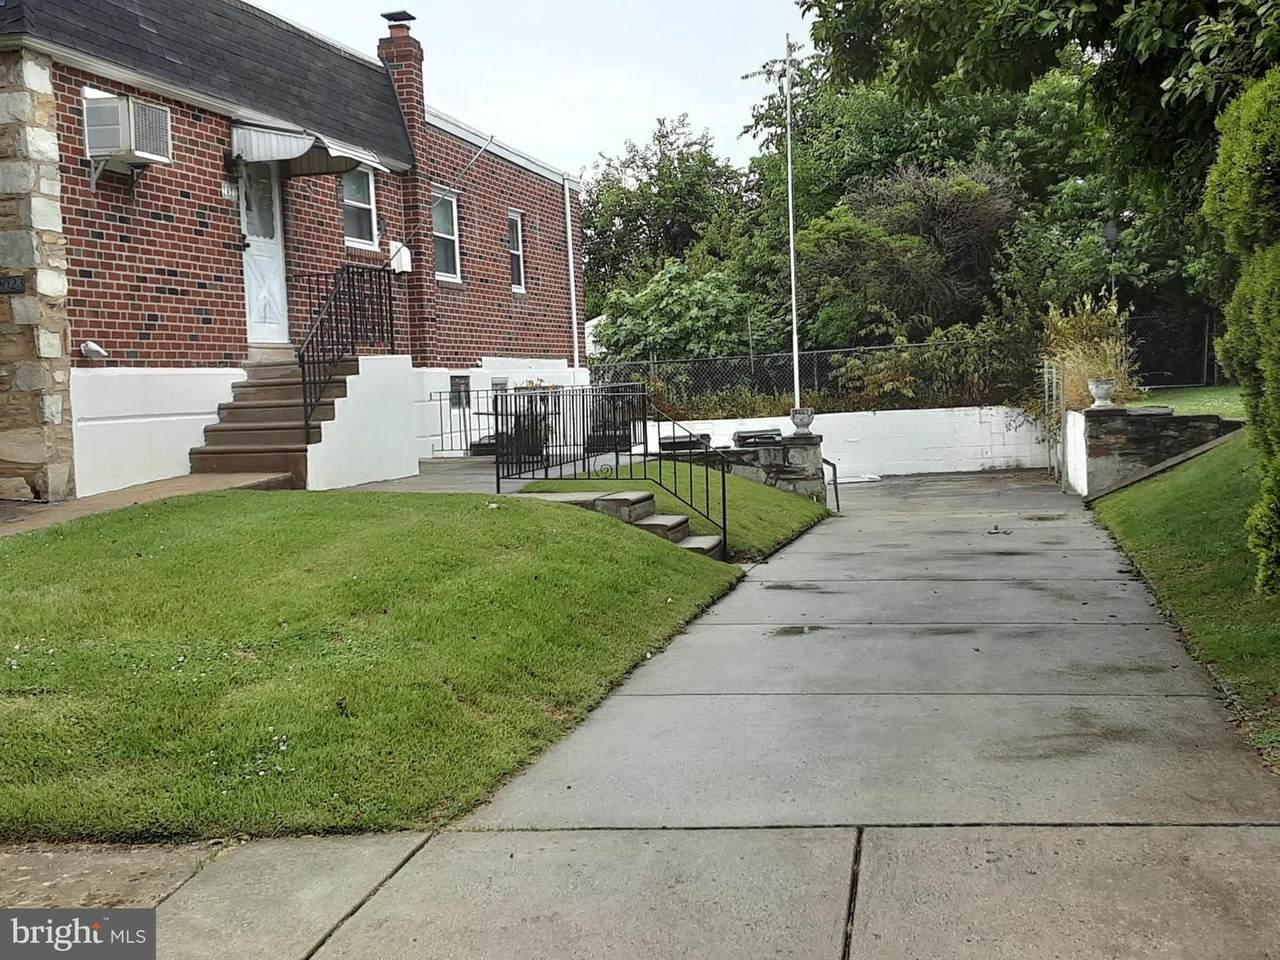 2023 Greymont Street - Photo 1